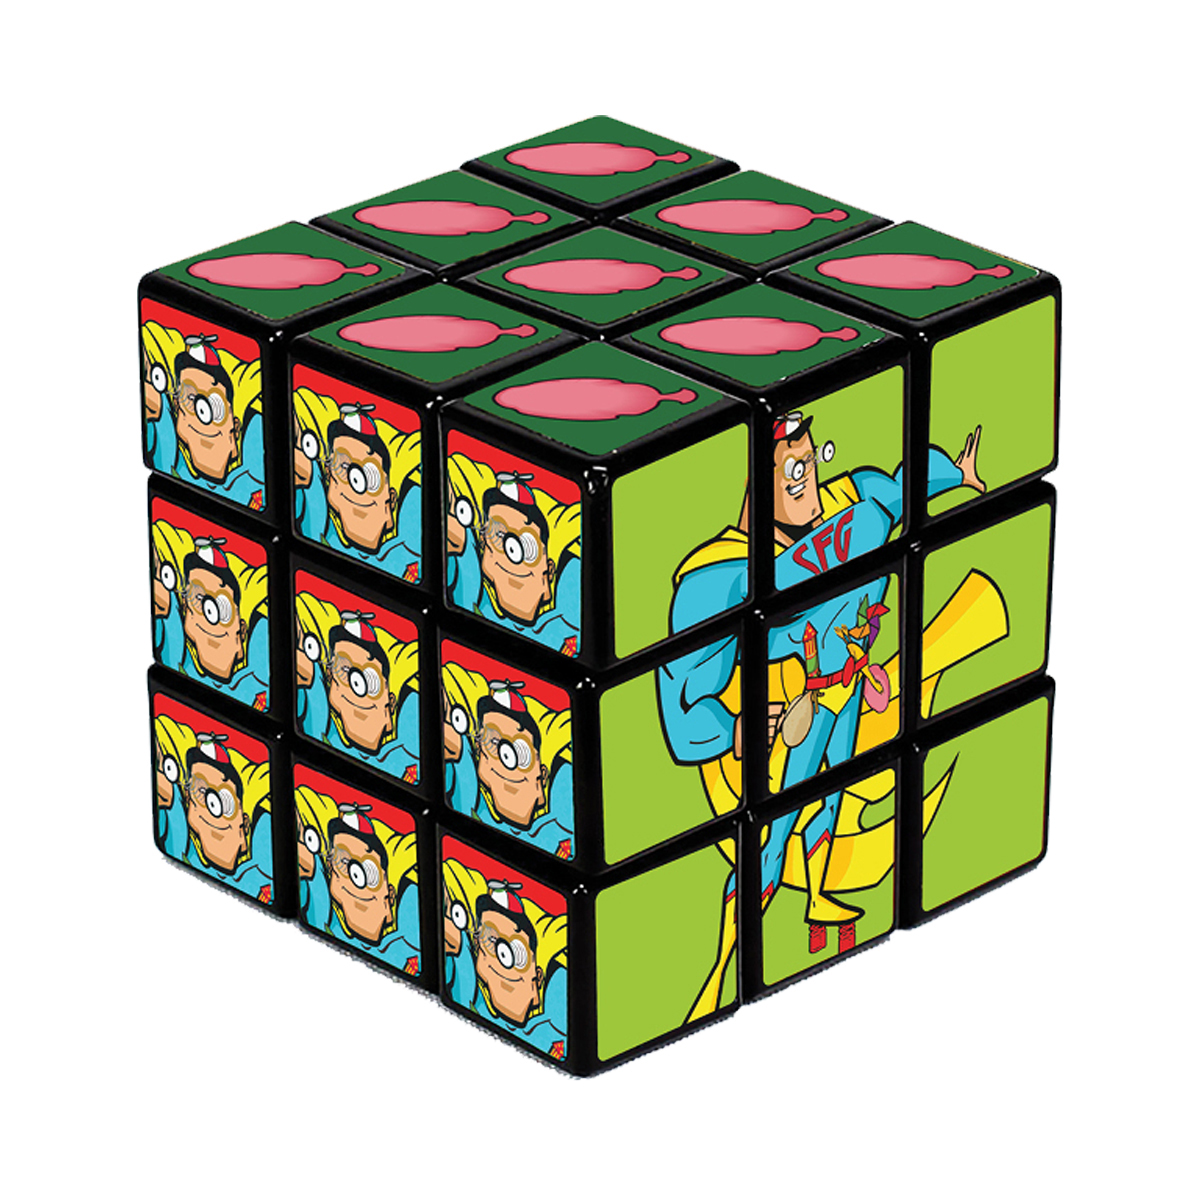 Scorpion Super Fun Guy Puzzle Cube